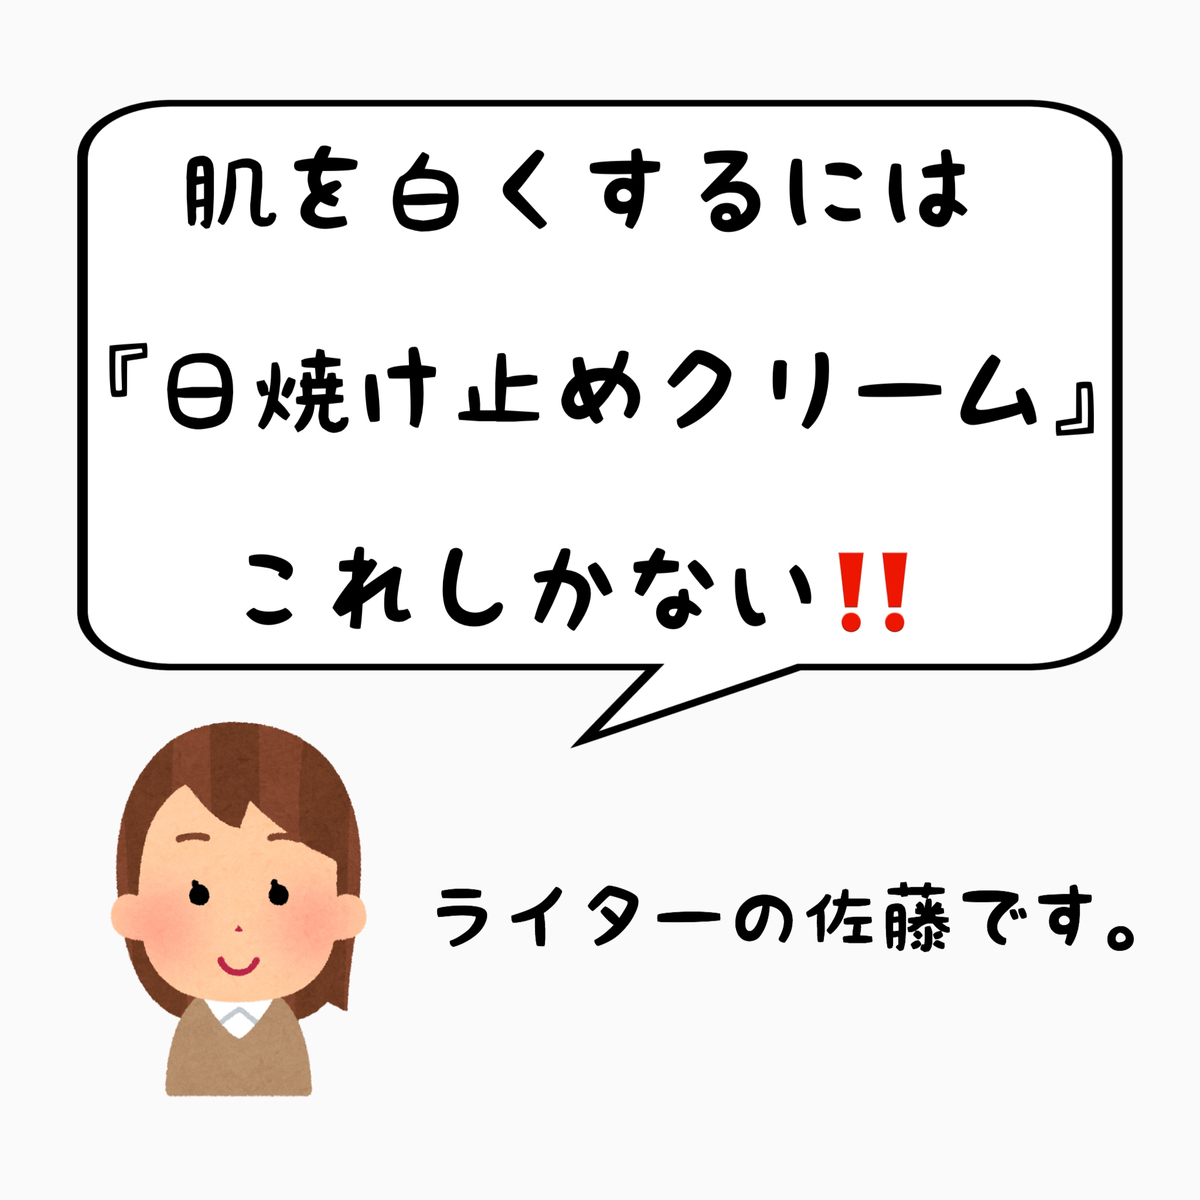 f:id:nokonoko_o:20210110151438j:plain